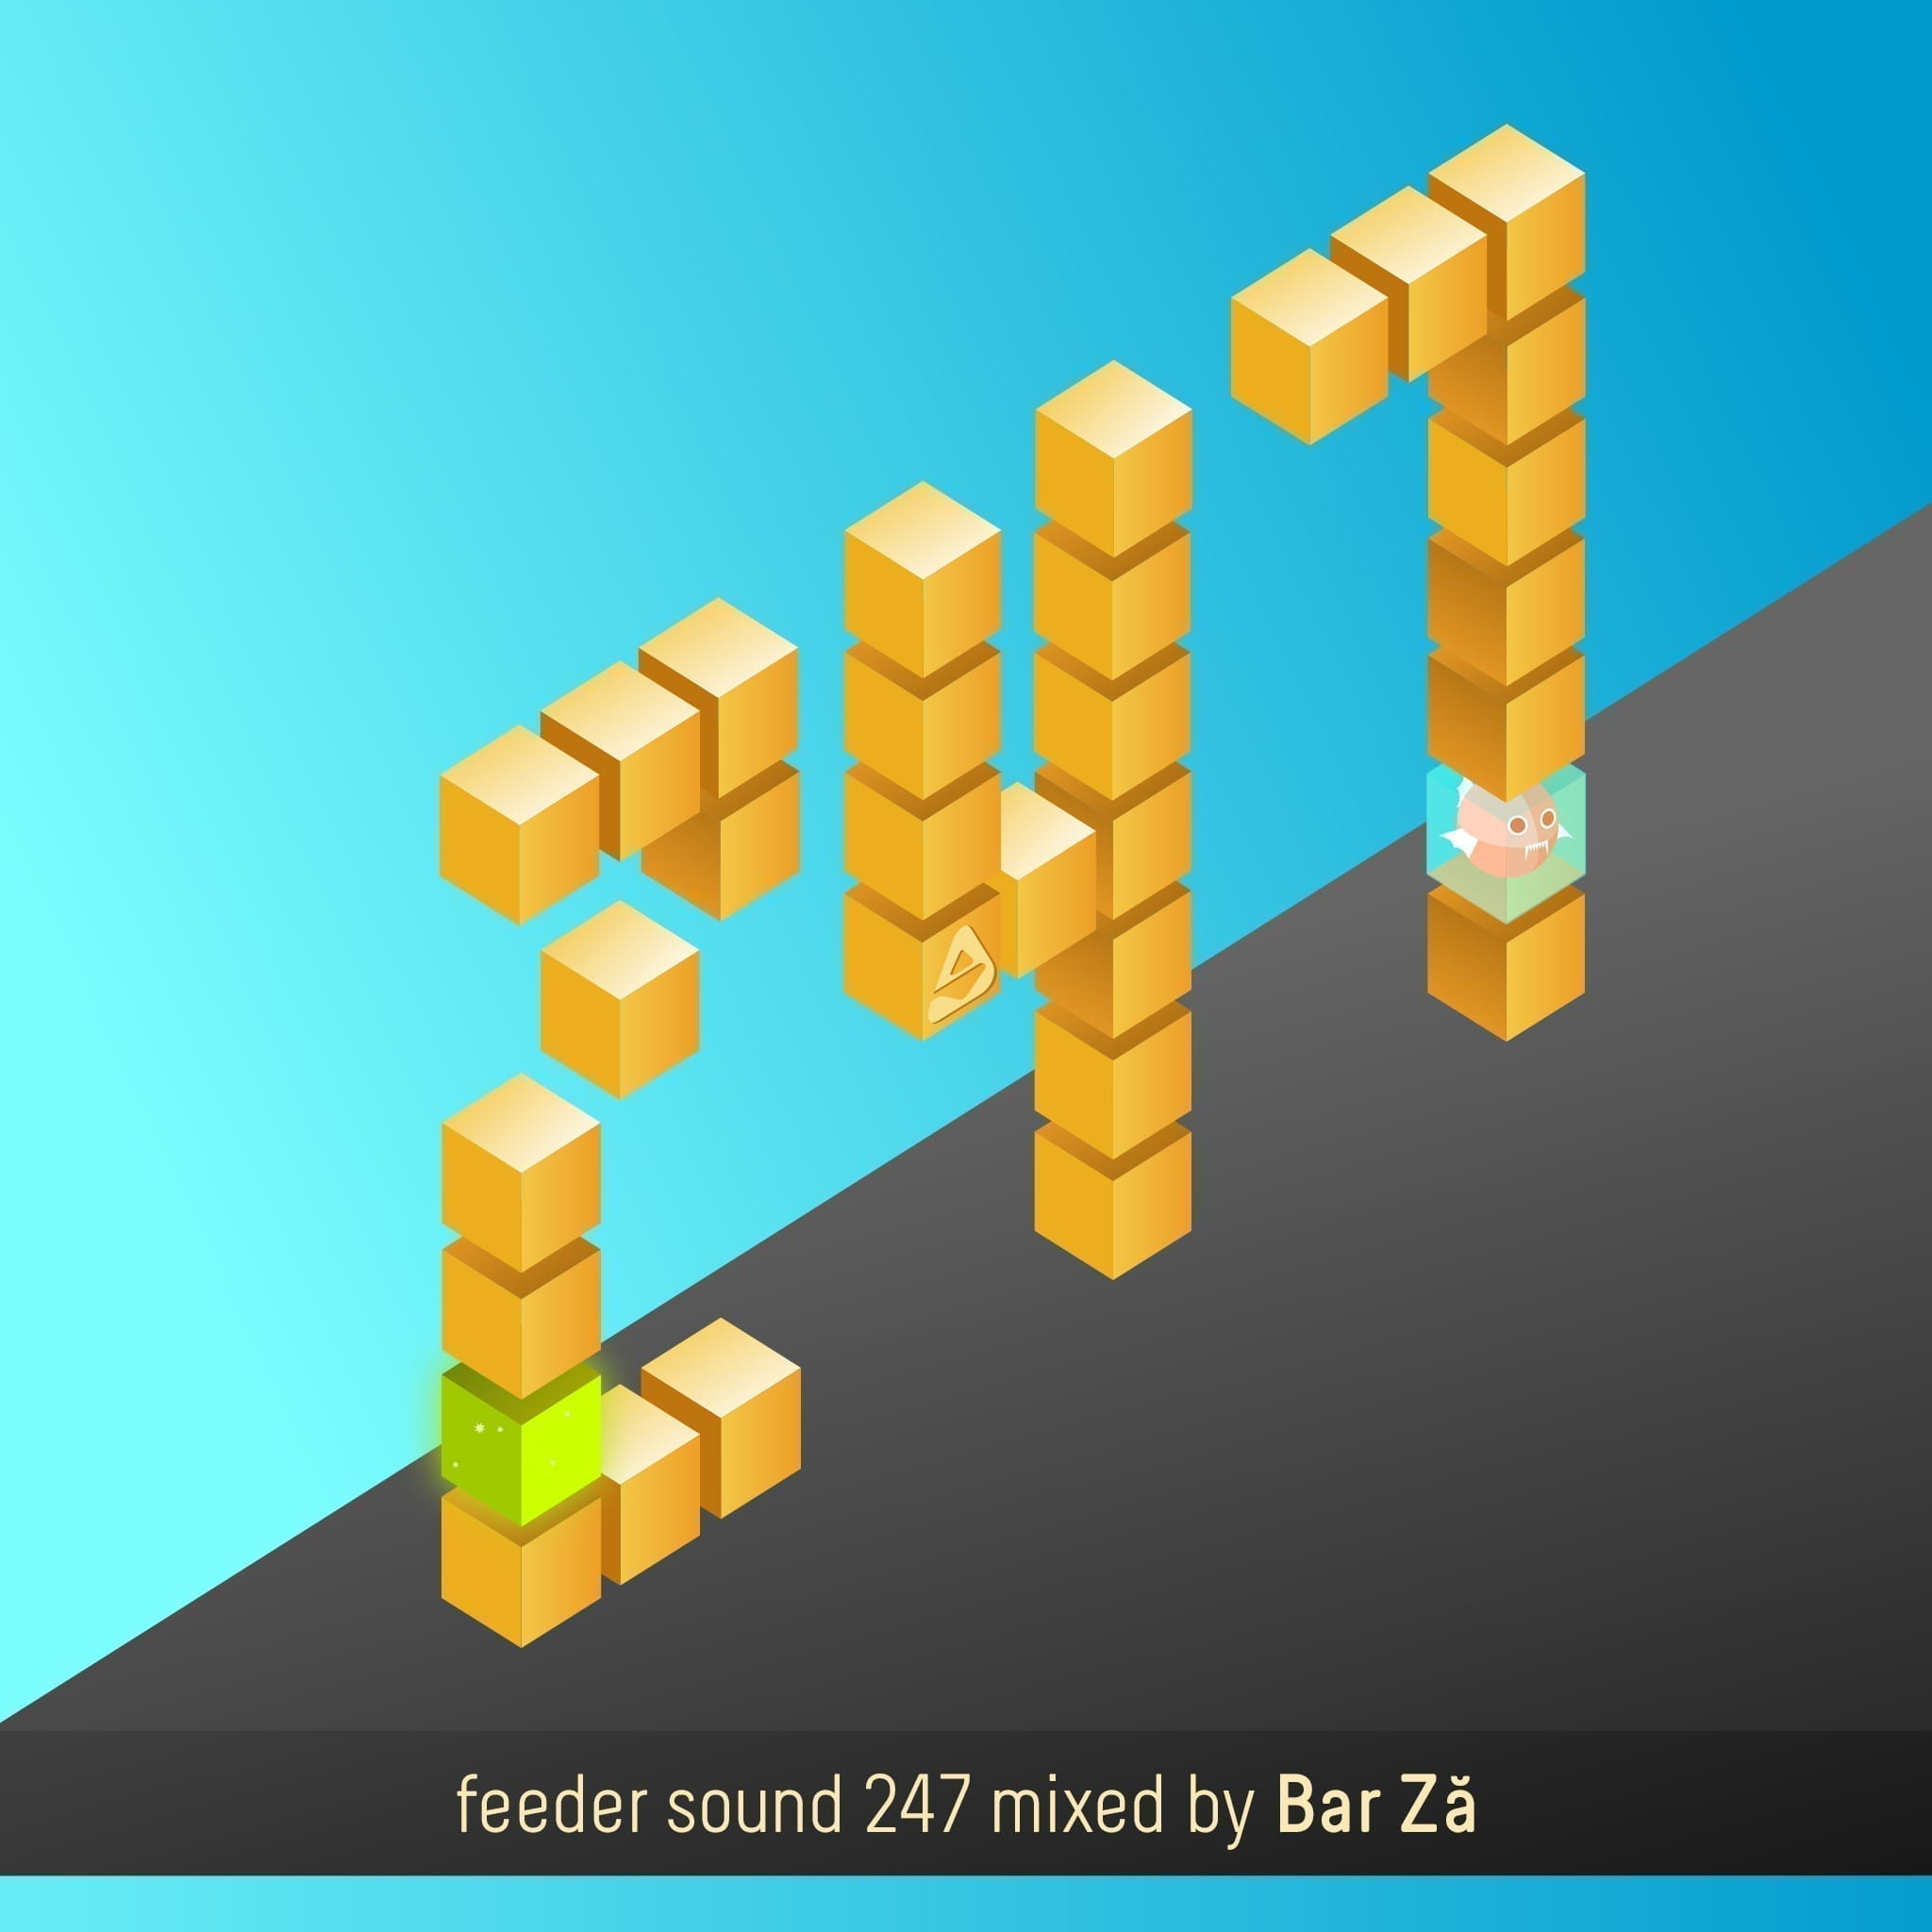 feeder sound 247 mixed by Bar Za 01